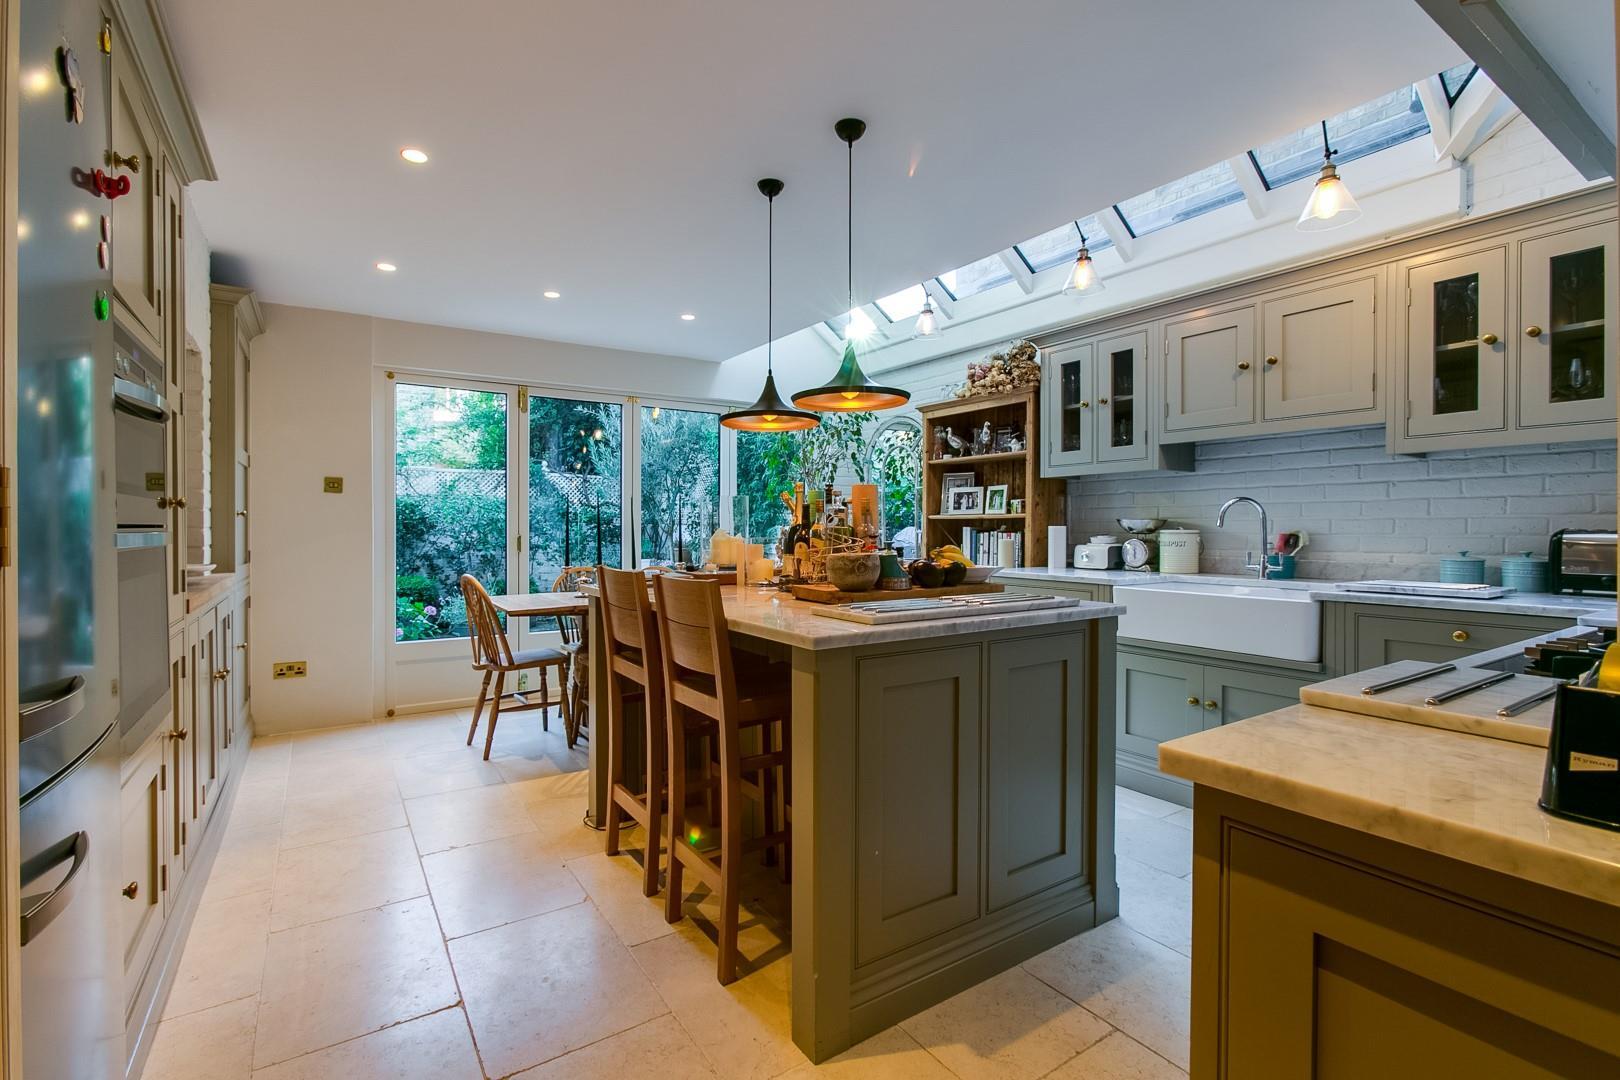 4 bedroom house for sale in Beryl Road, London, W6 | Lawson Rutter